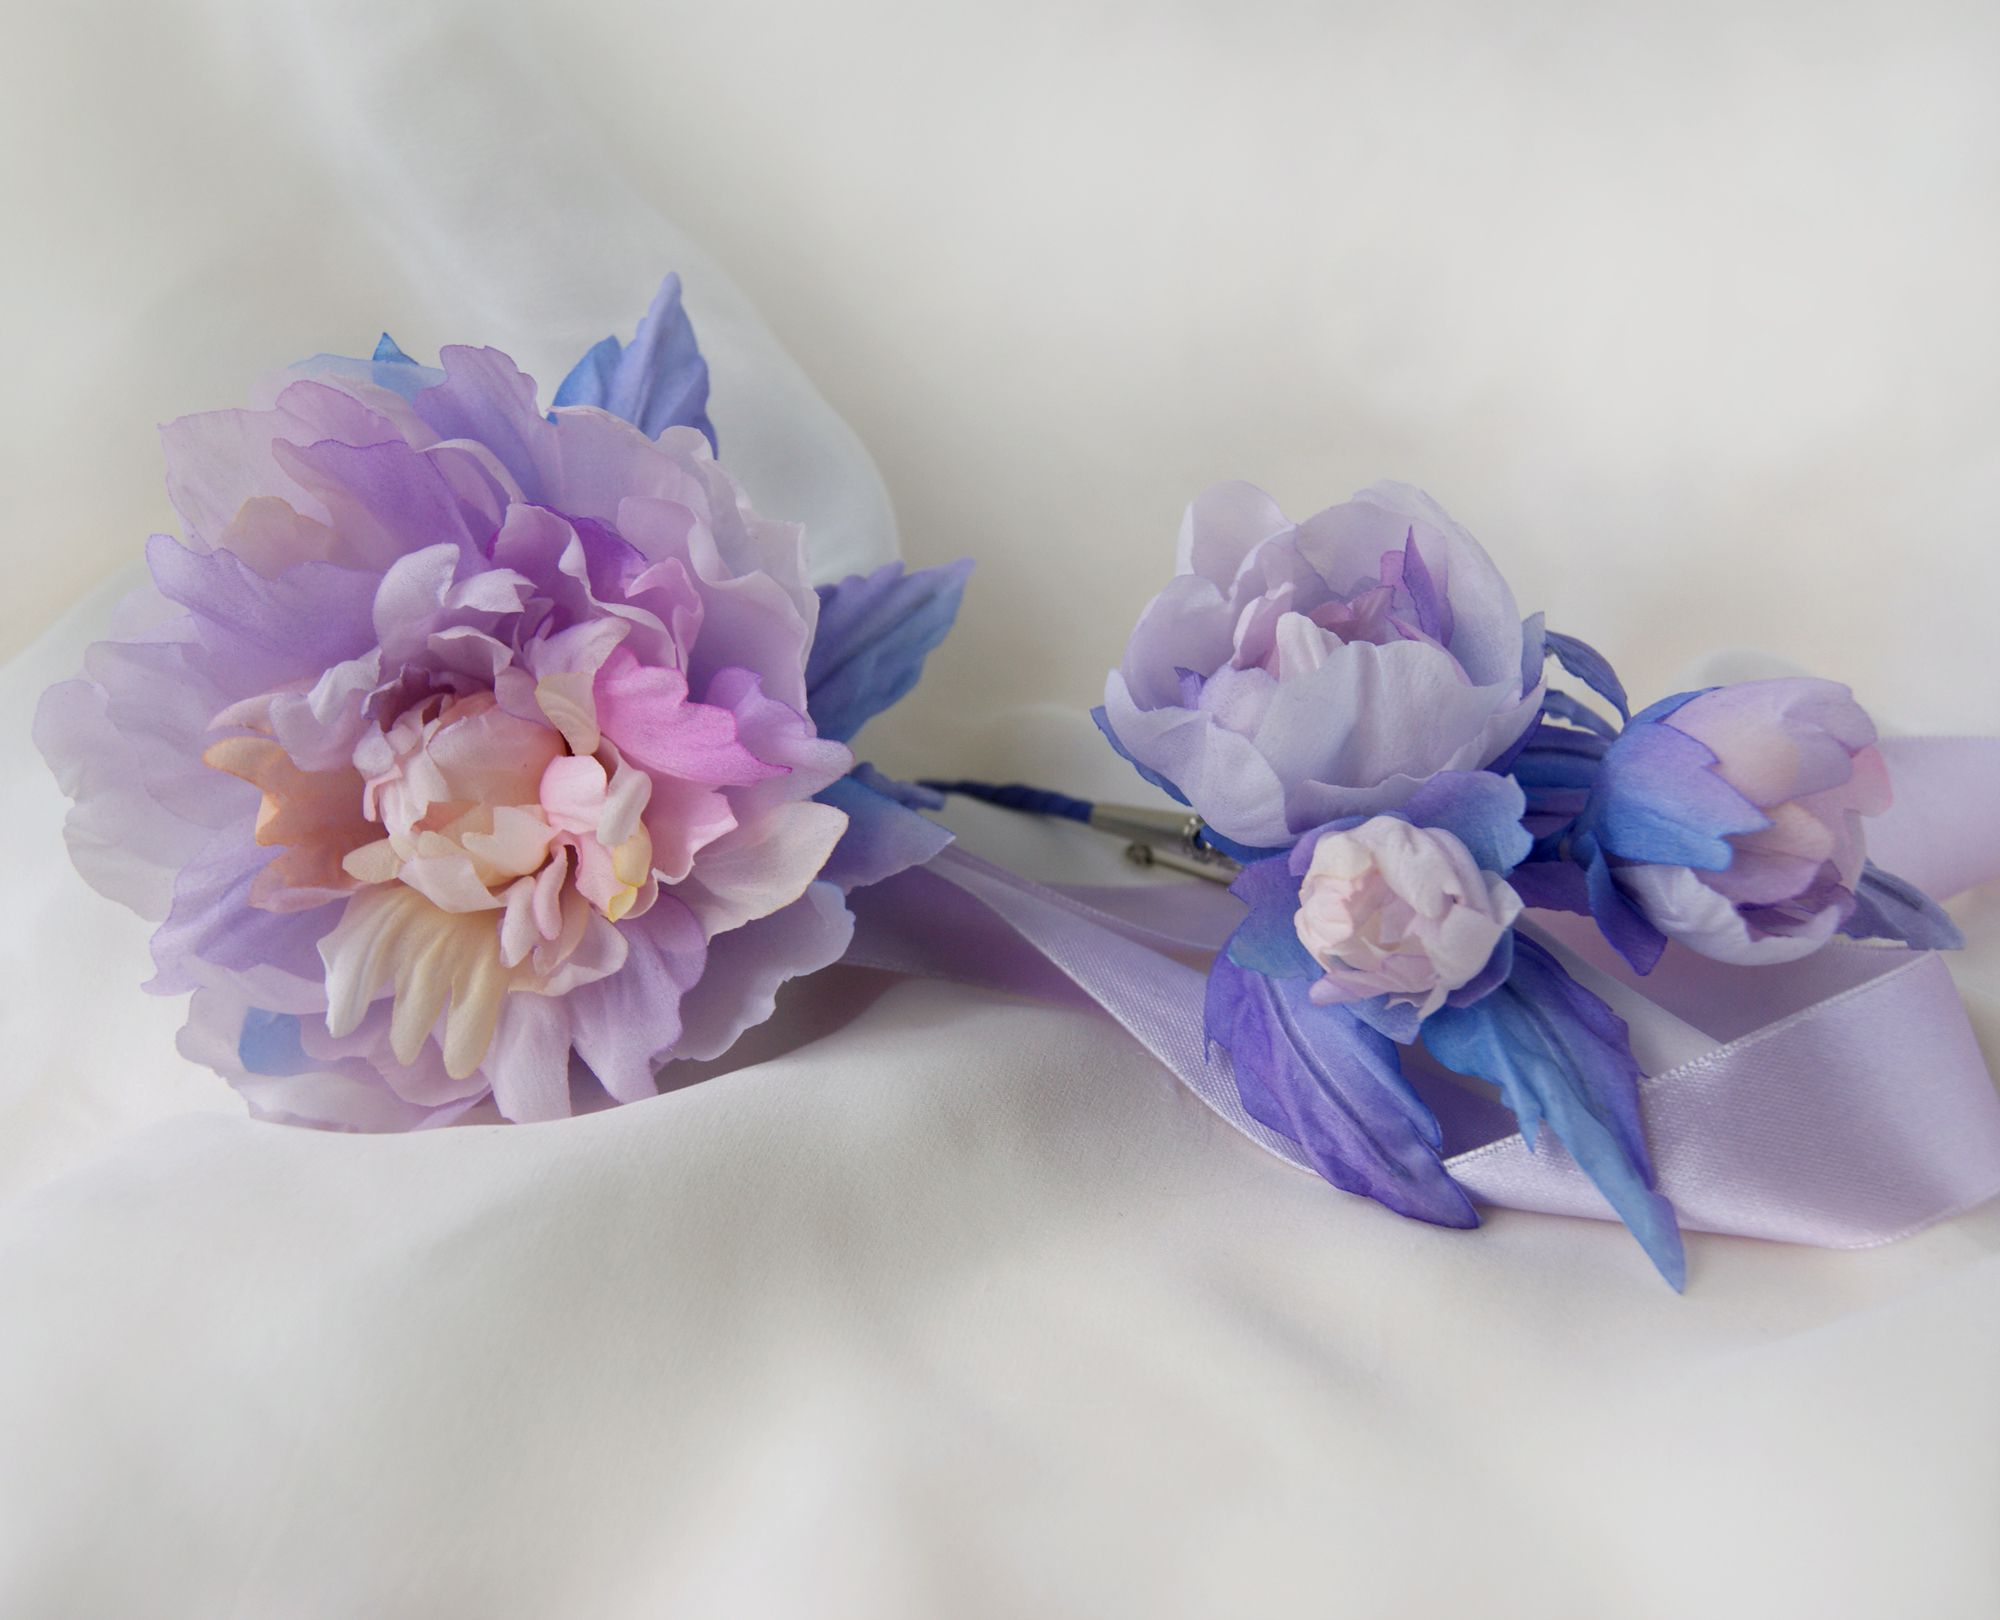 аксессуарынасвадьбу браслет свадьба цветыизшелка пион бутоньерка невеста